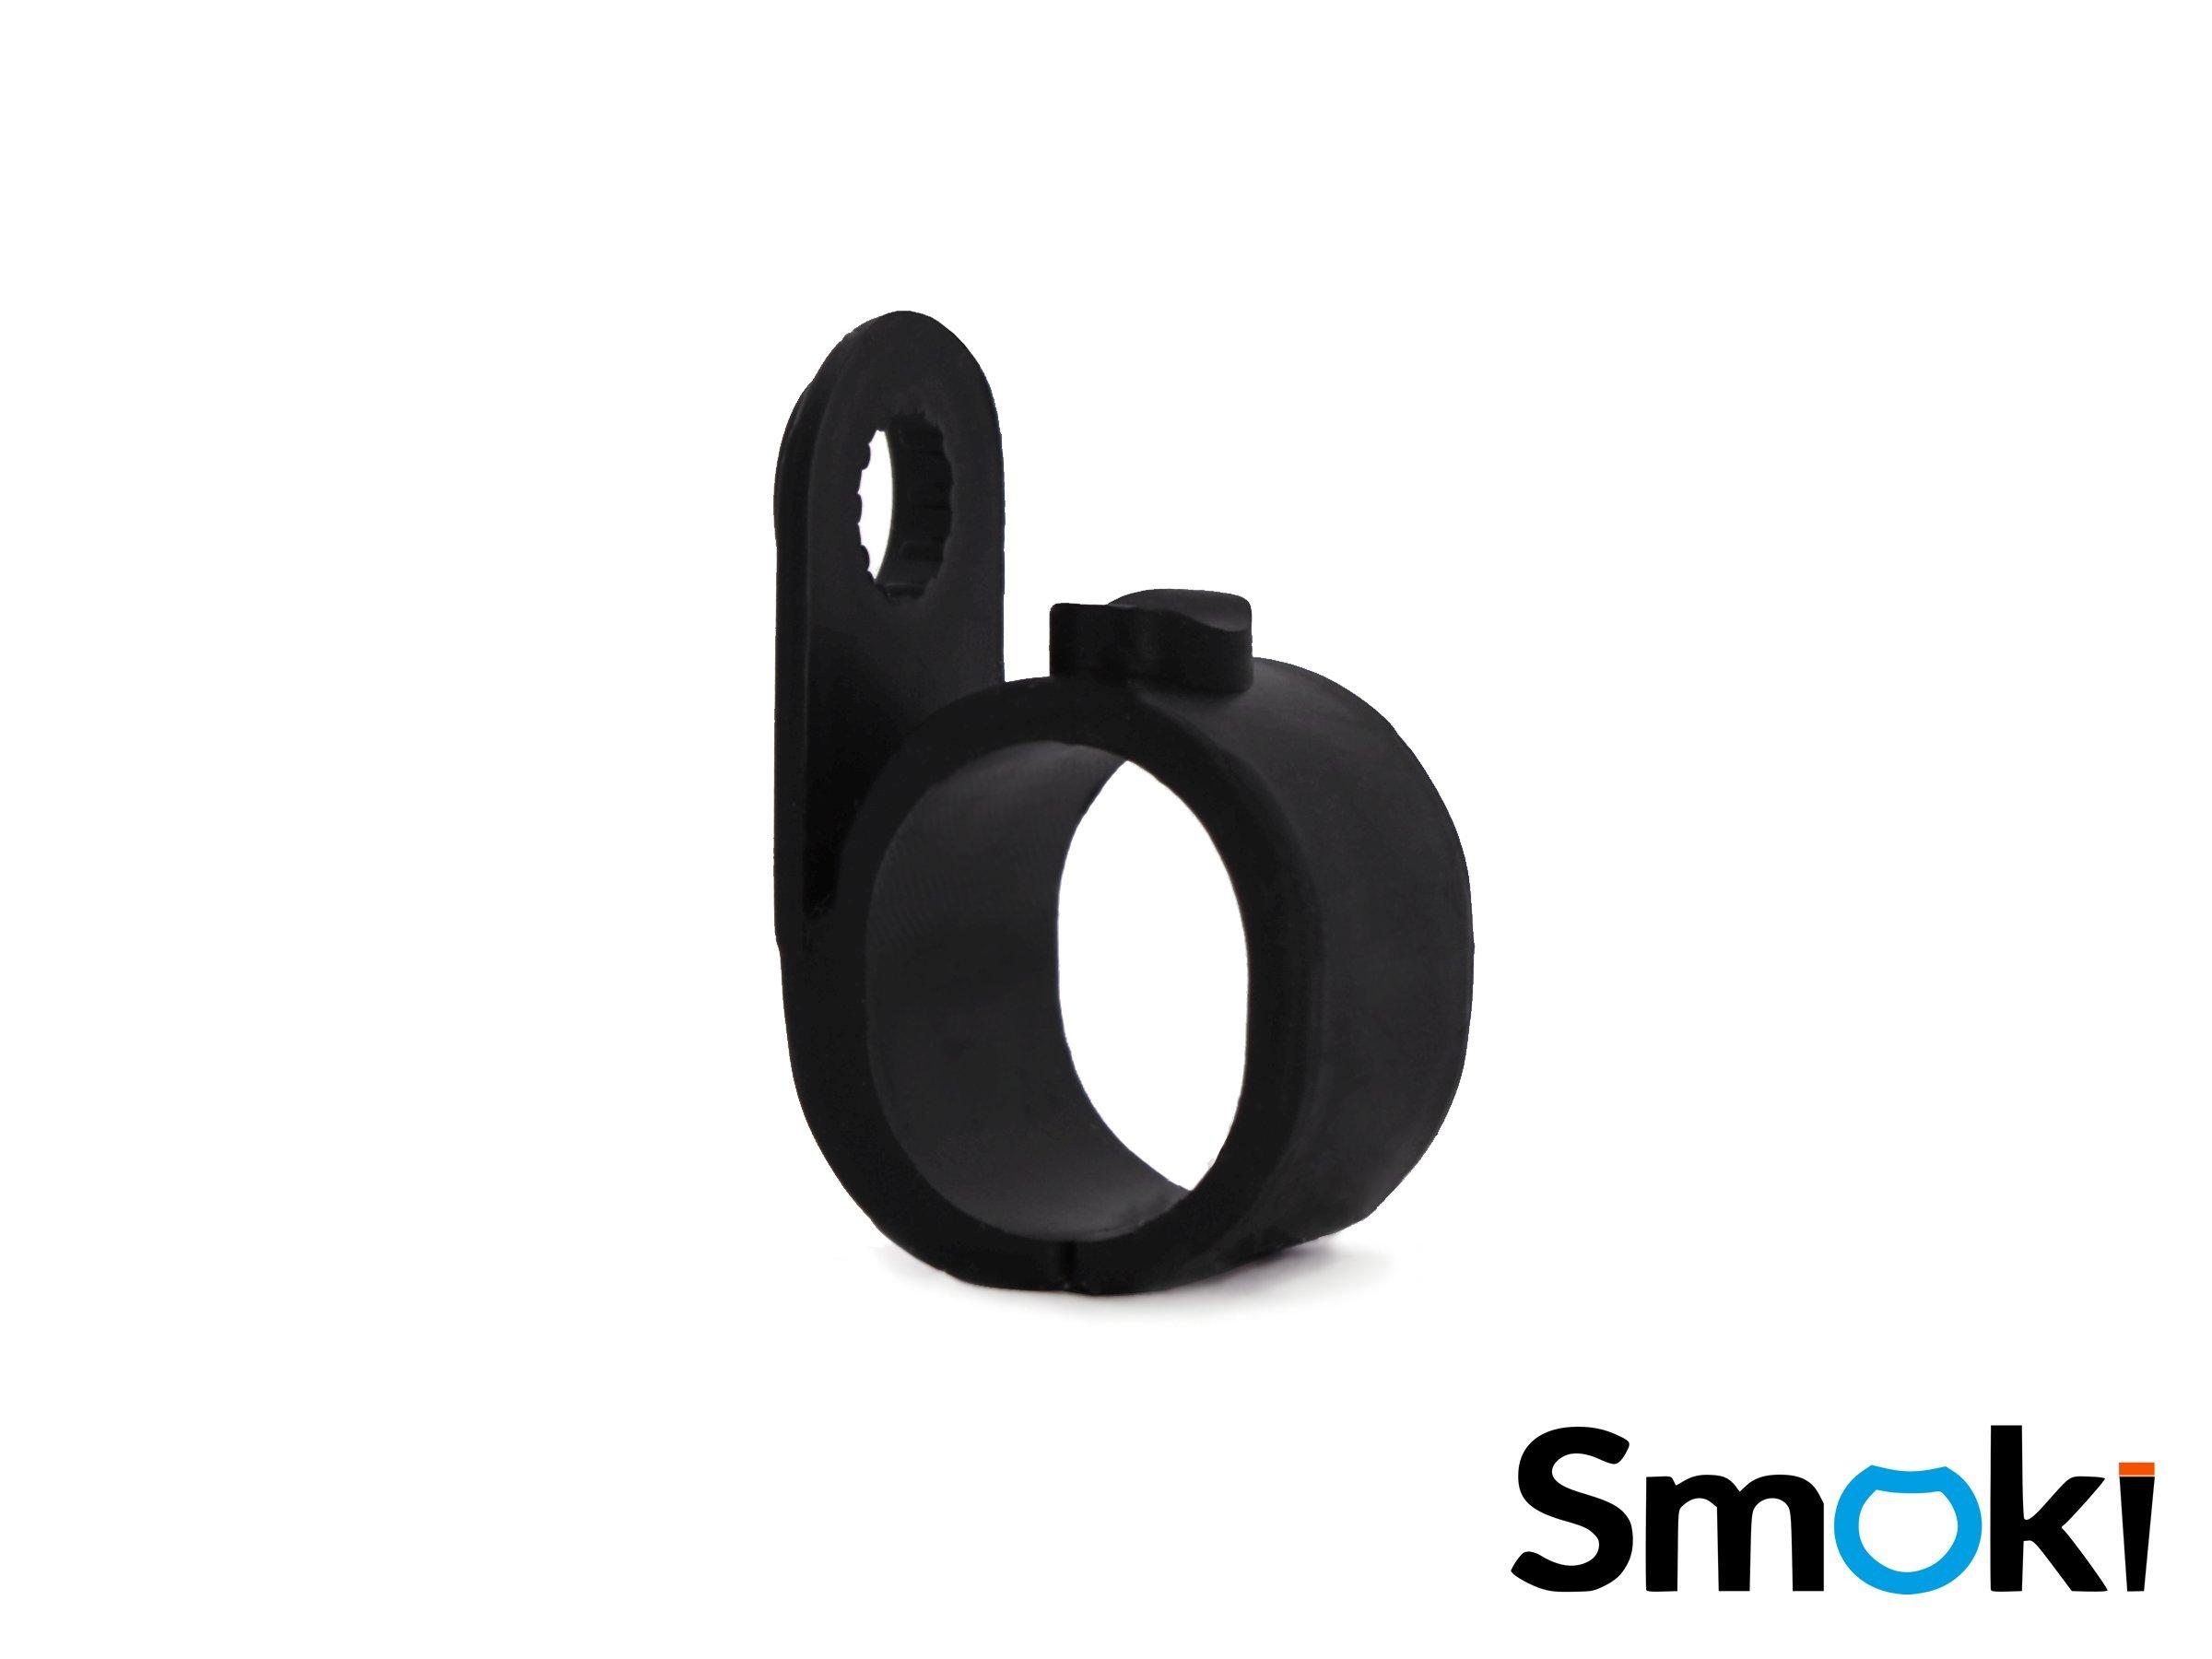 Smoki Holder Ring For smokers Smoke Hand Rack Cigarette Holder Accessories Gift Black&Blue&Green&Red